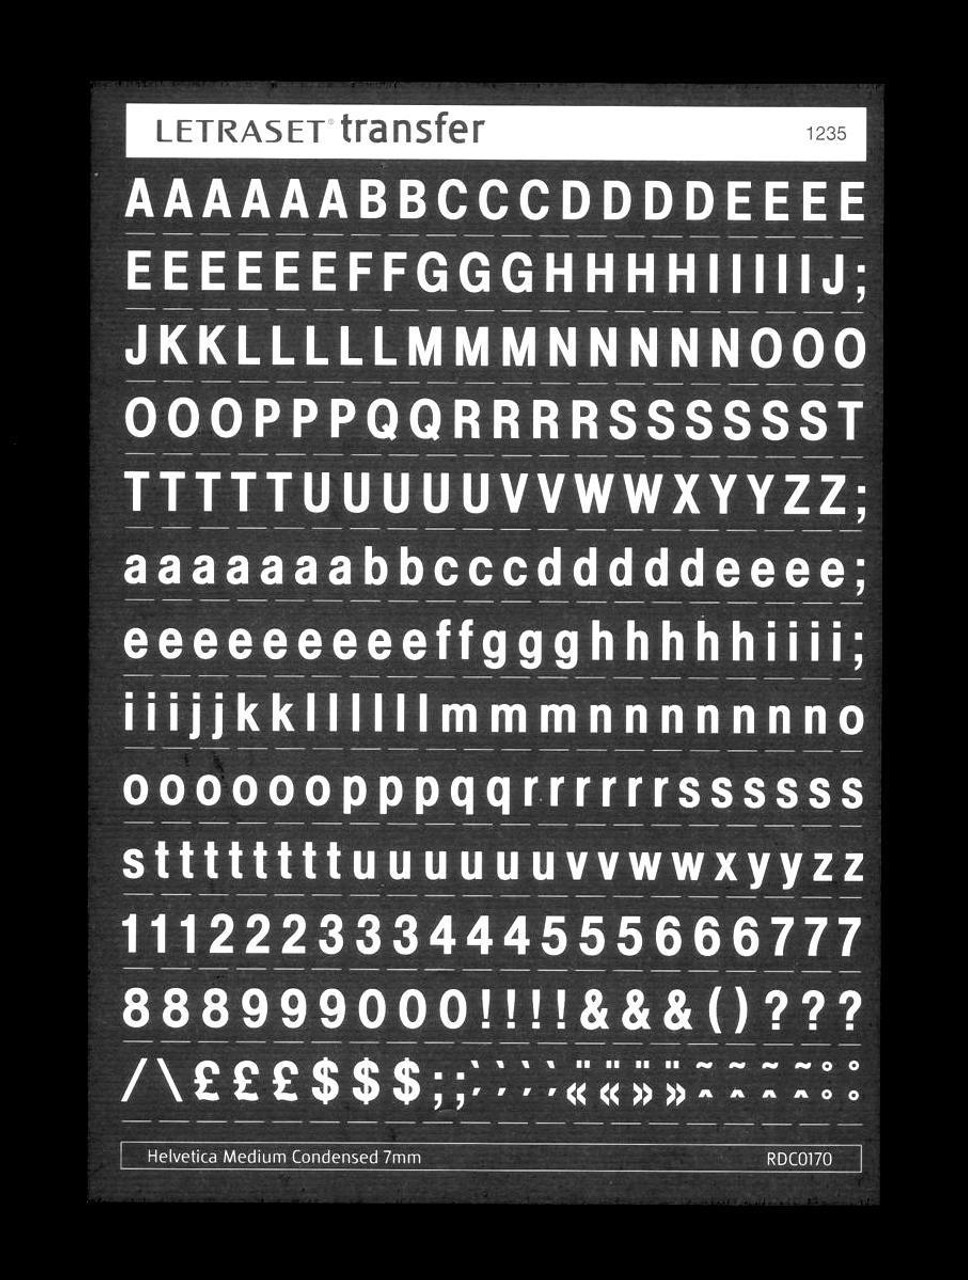 7mm, White , Helvetica Medium Condensed , Letraset , RDC0170